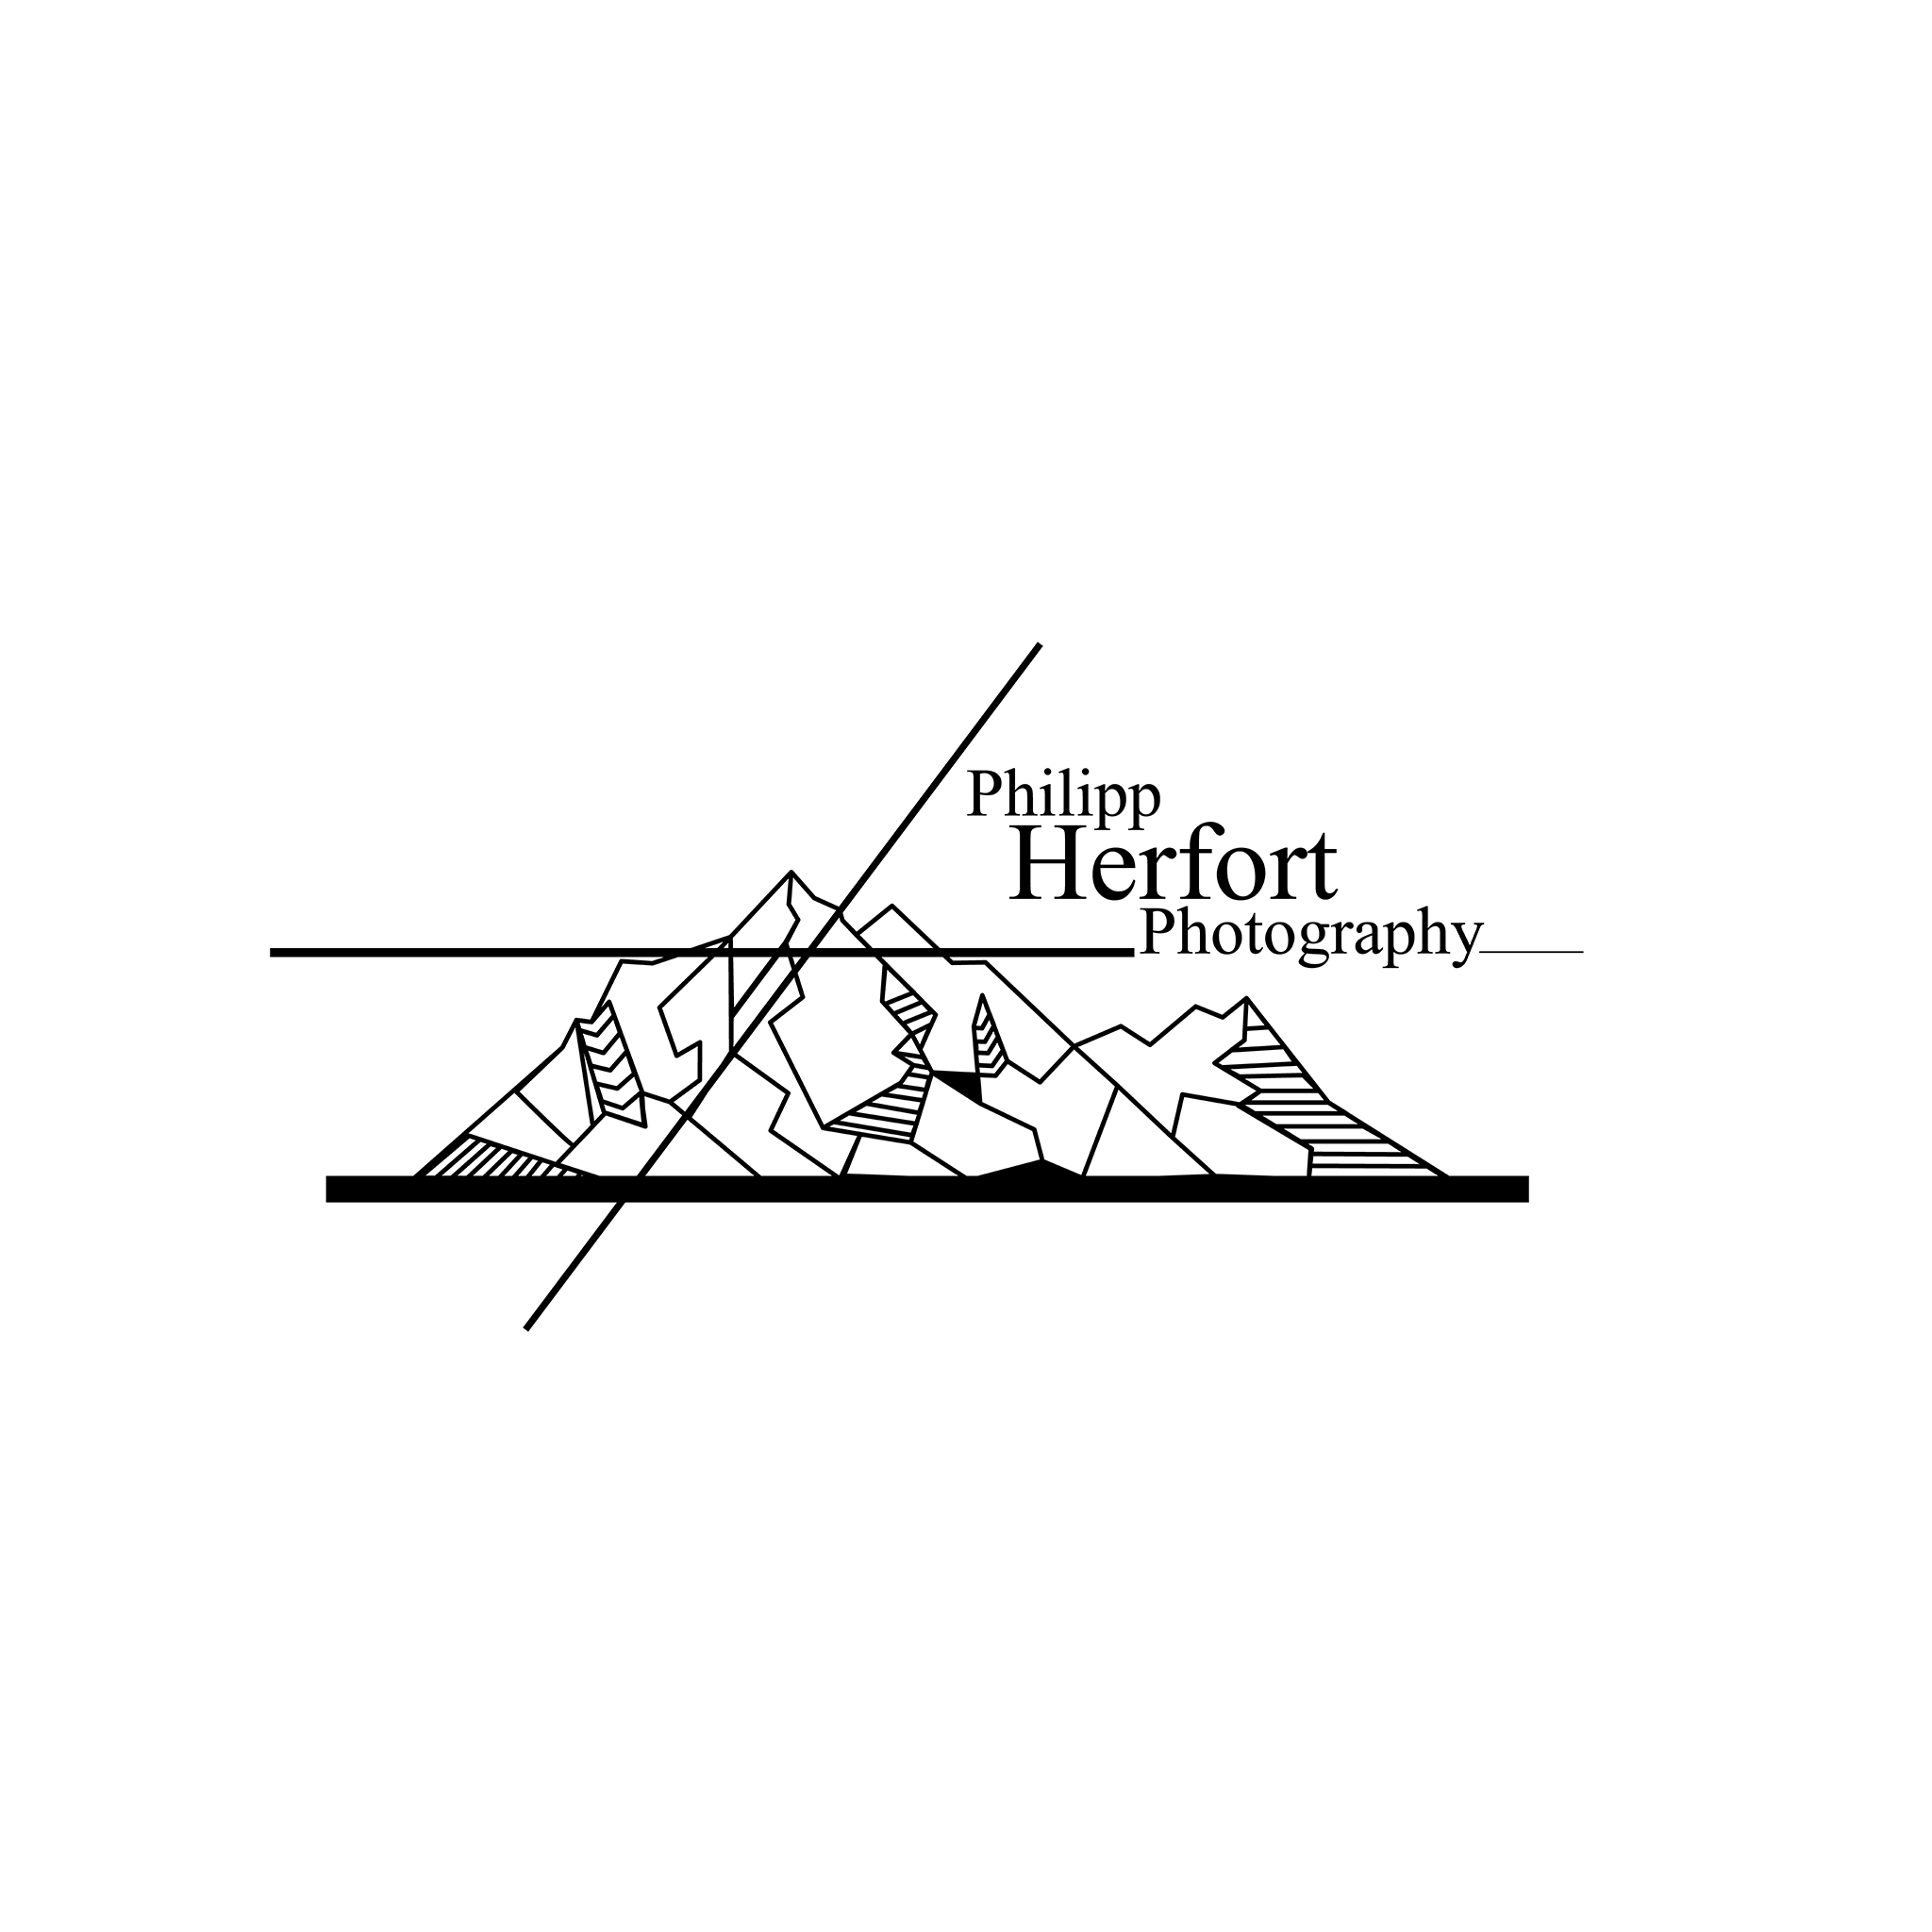 Ph-otography - Philipp Herfort Photography